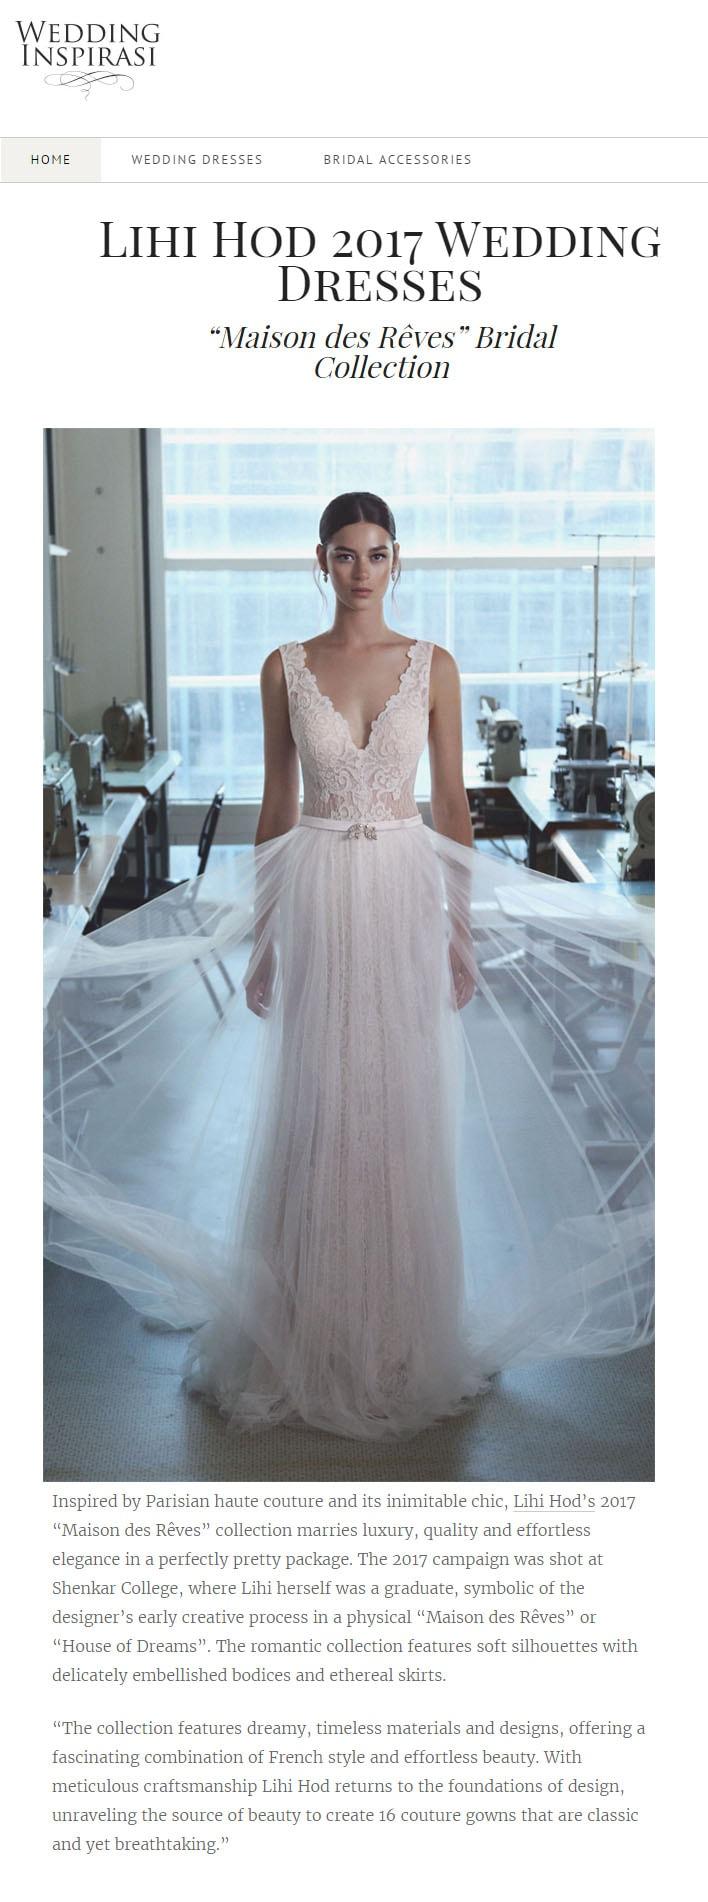 Wedding Inspirasi: LIHI HOD 2017 WEDDING  DRESSES